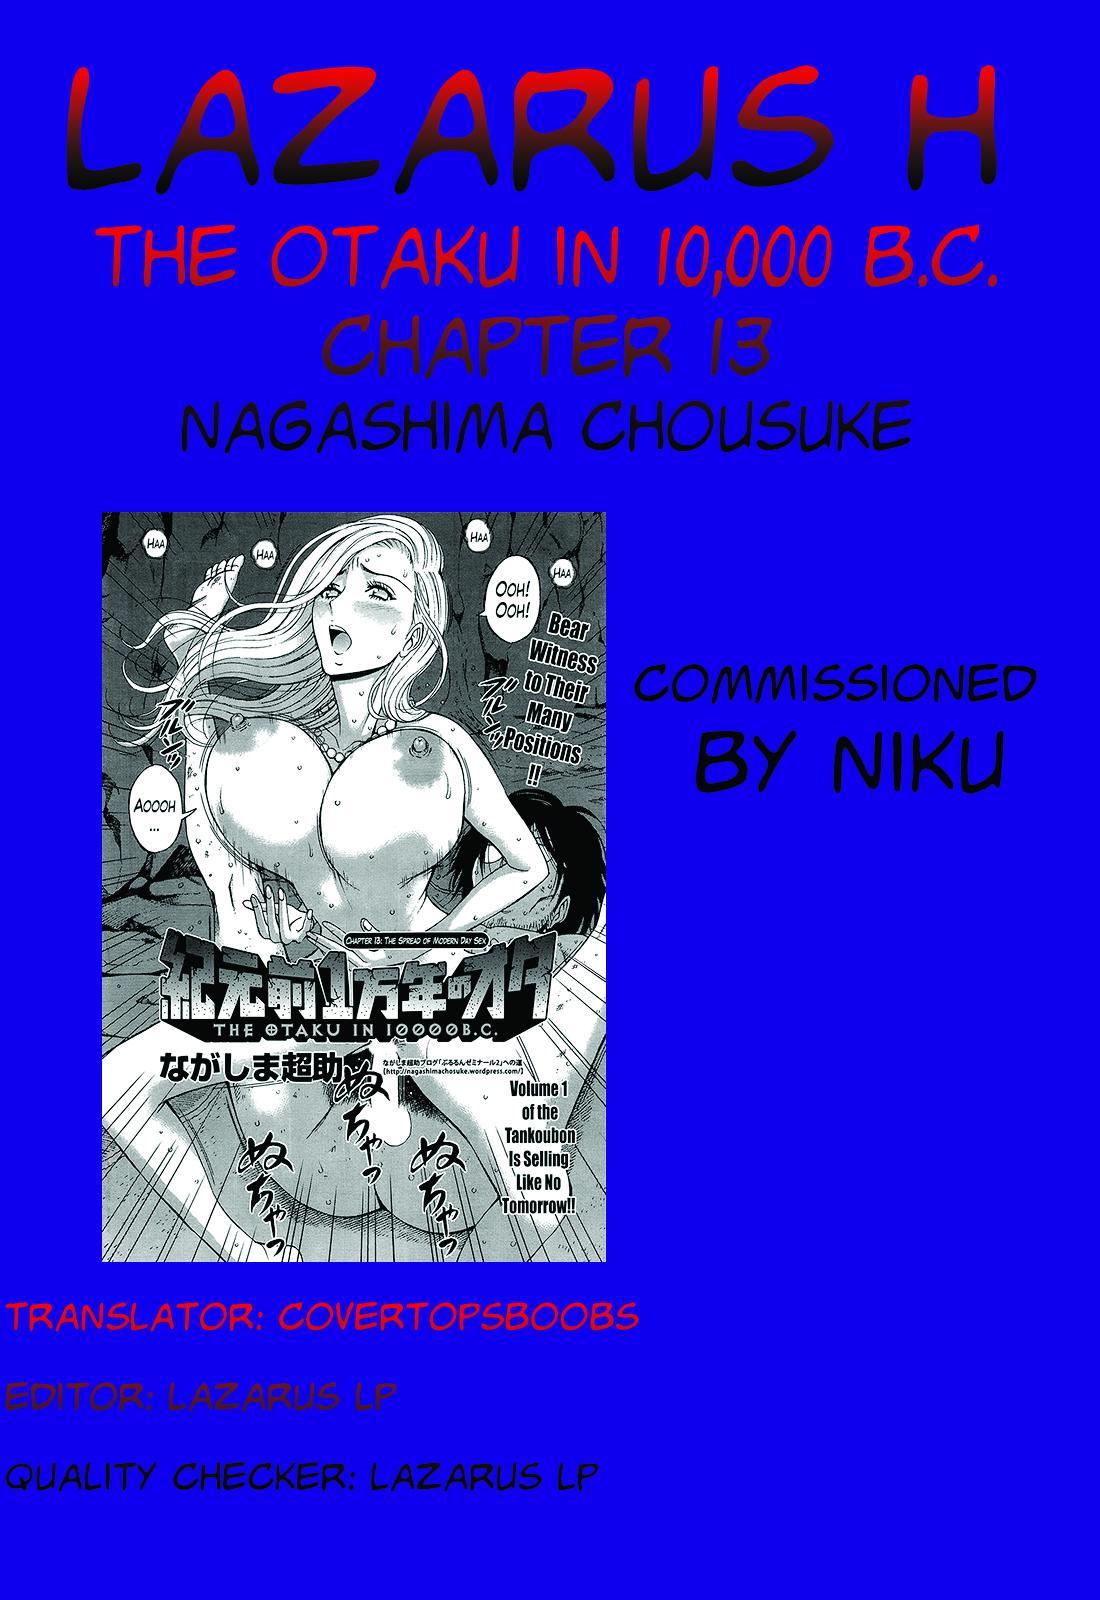 Kigenzen 10000 Nen no Ota | The Otaku in 10,000 B.C. 252